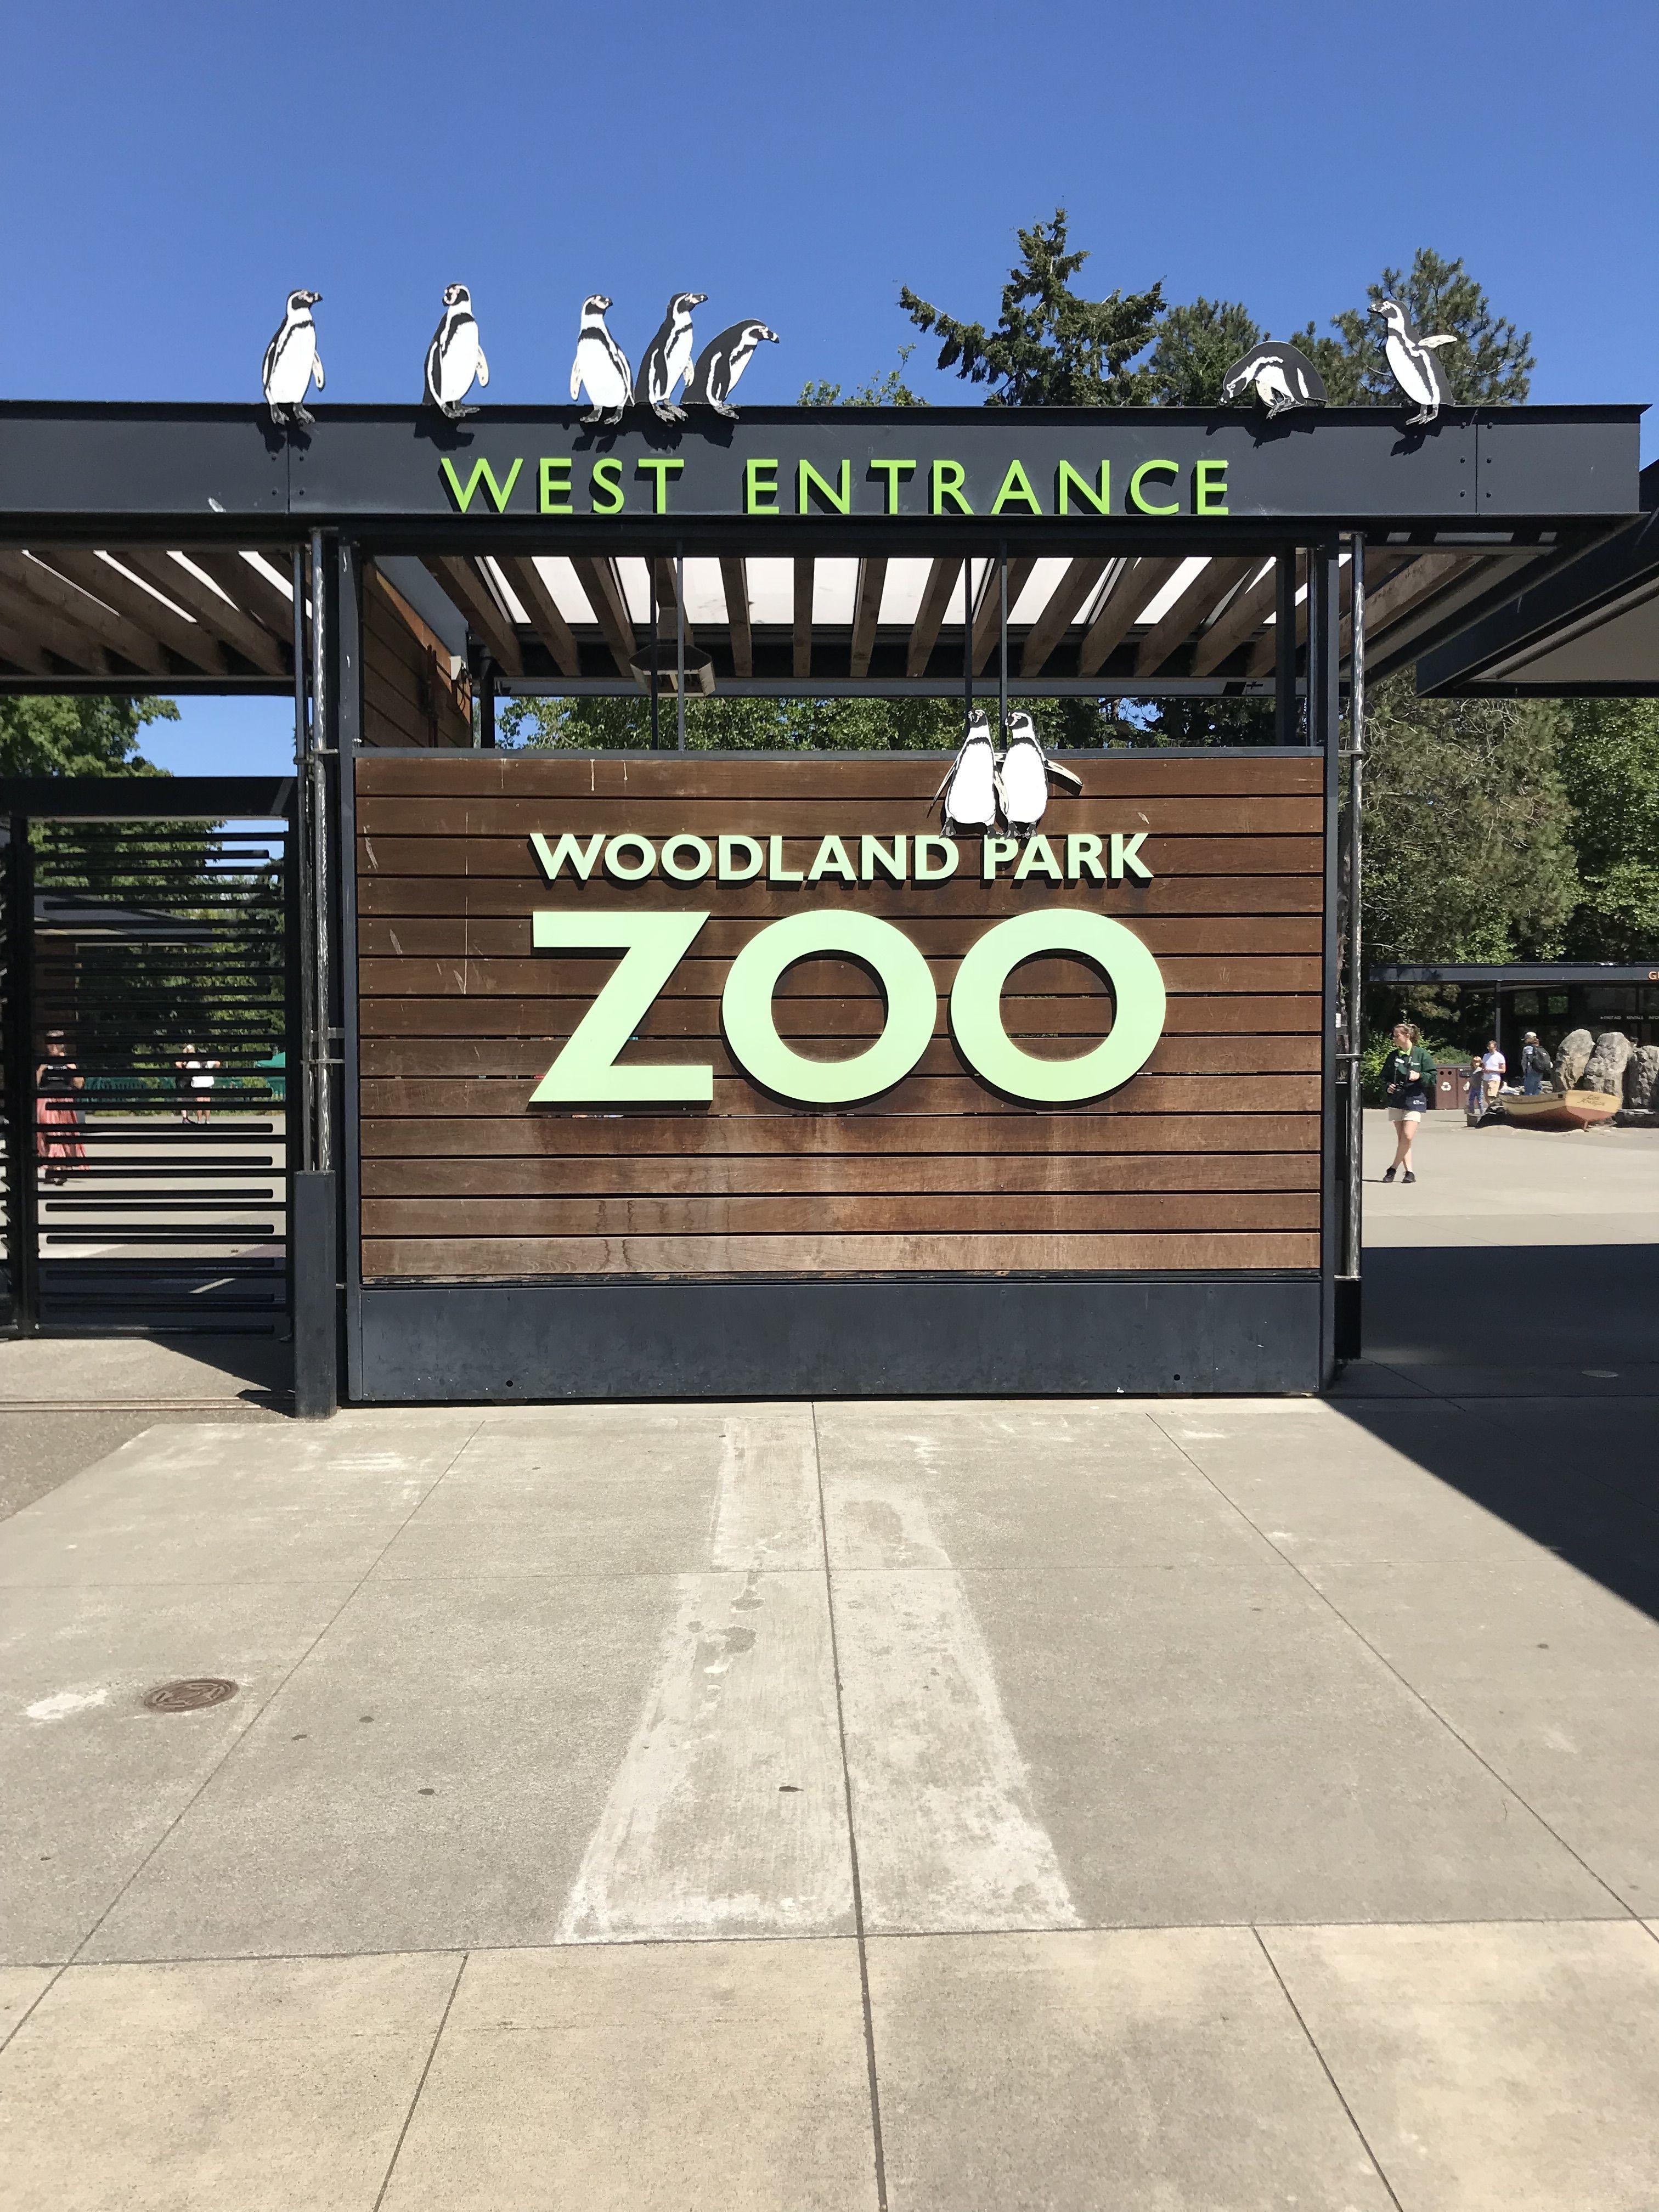 Woodland Park Zoo Seattle Wa Woodland Park Zoo Seattle Neighborhoods South Seattle